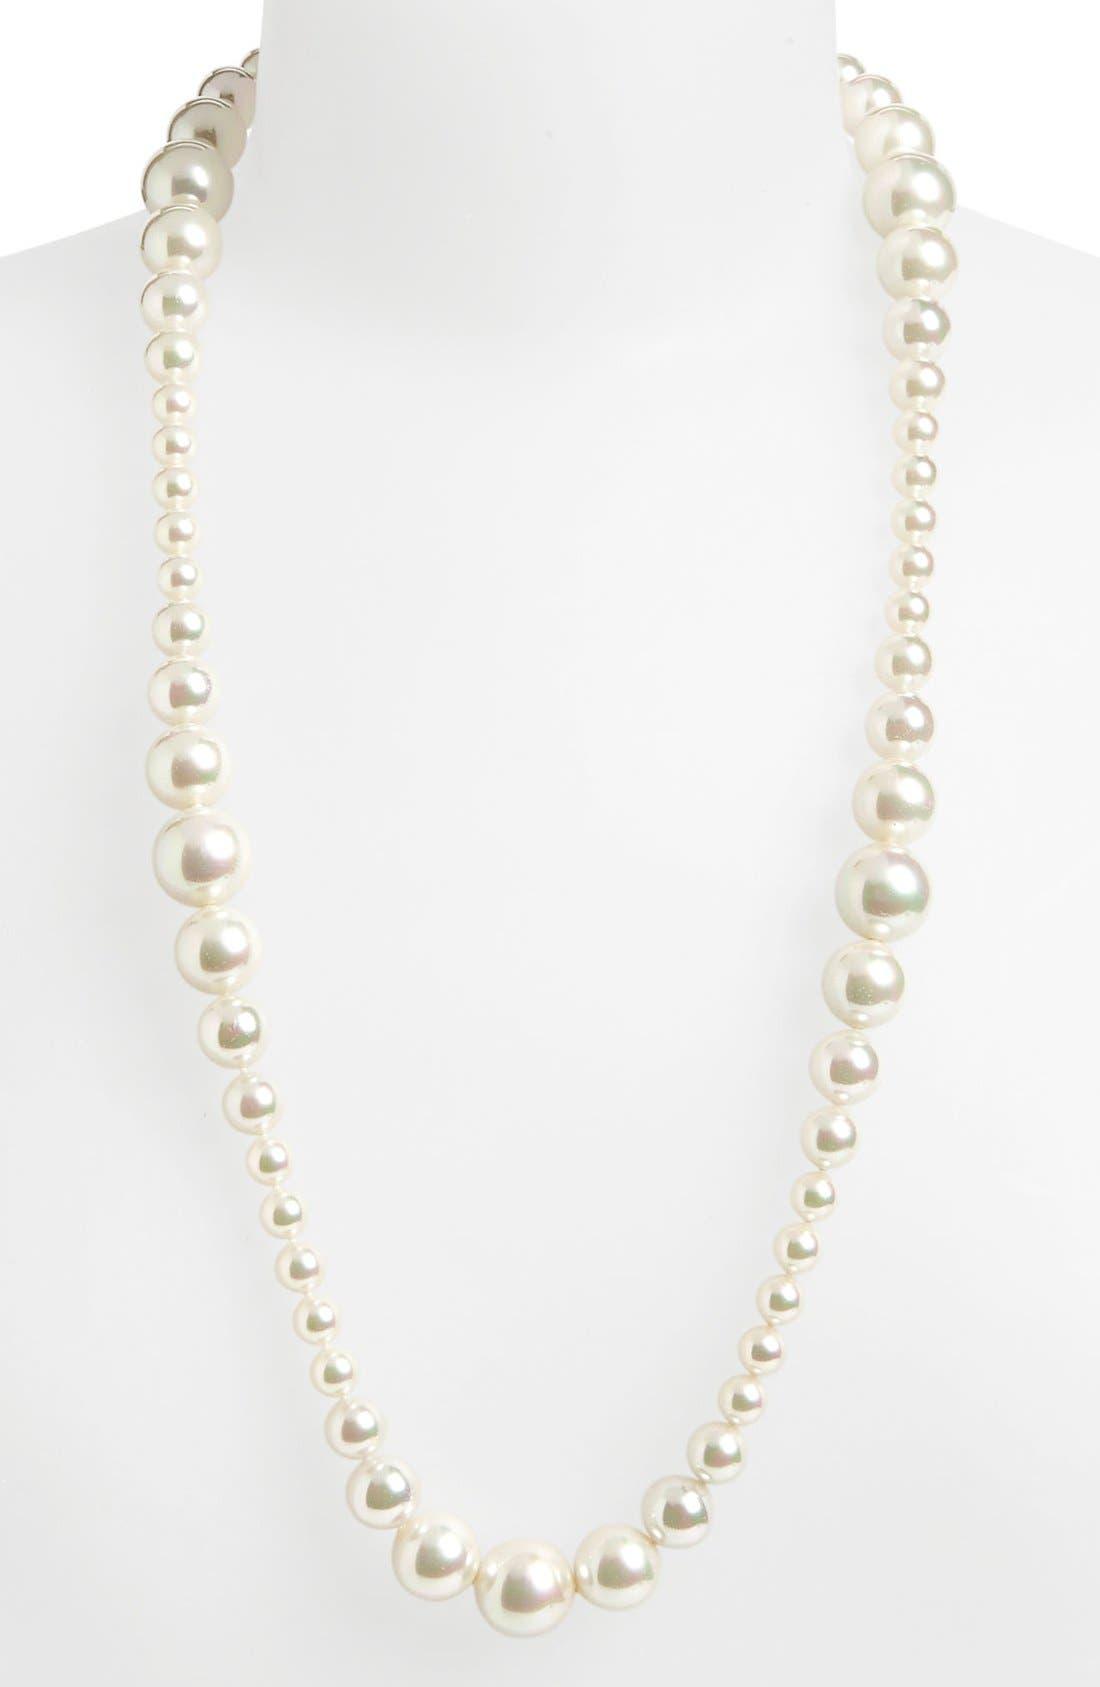 Main Image - Majorica 'Divina' Graduated Pearl Necklace